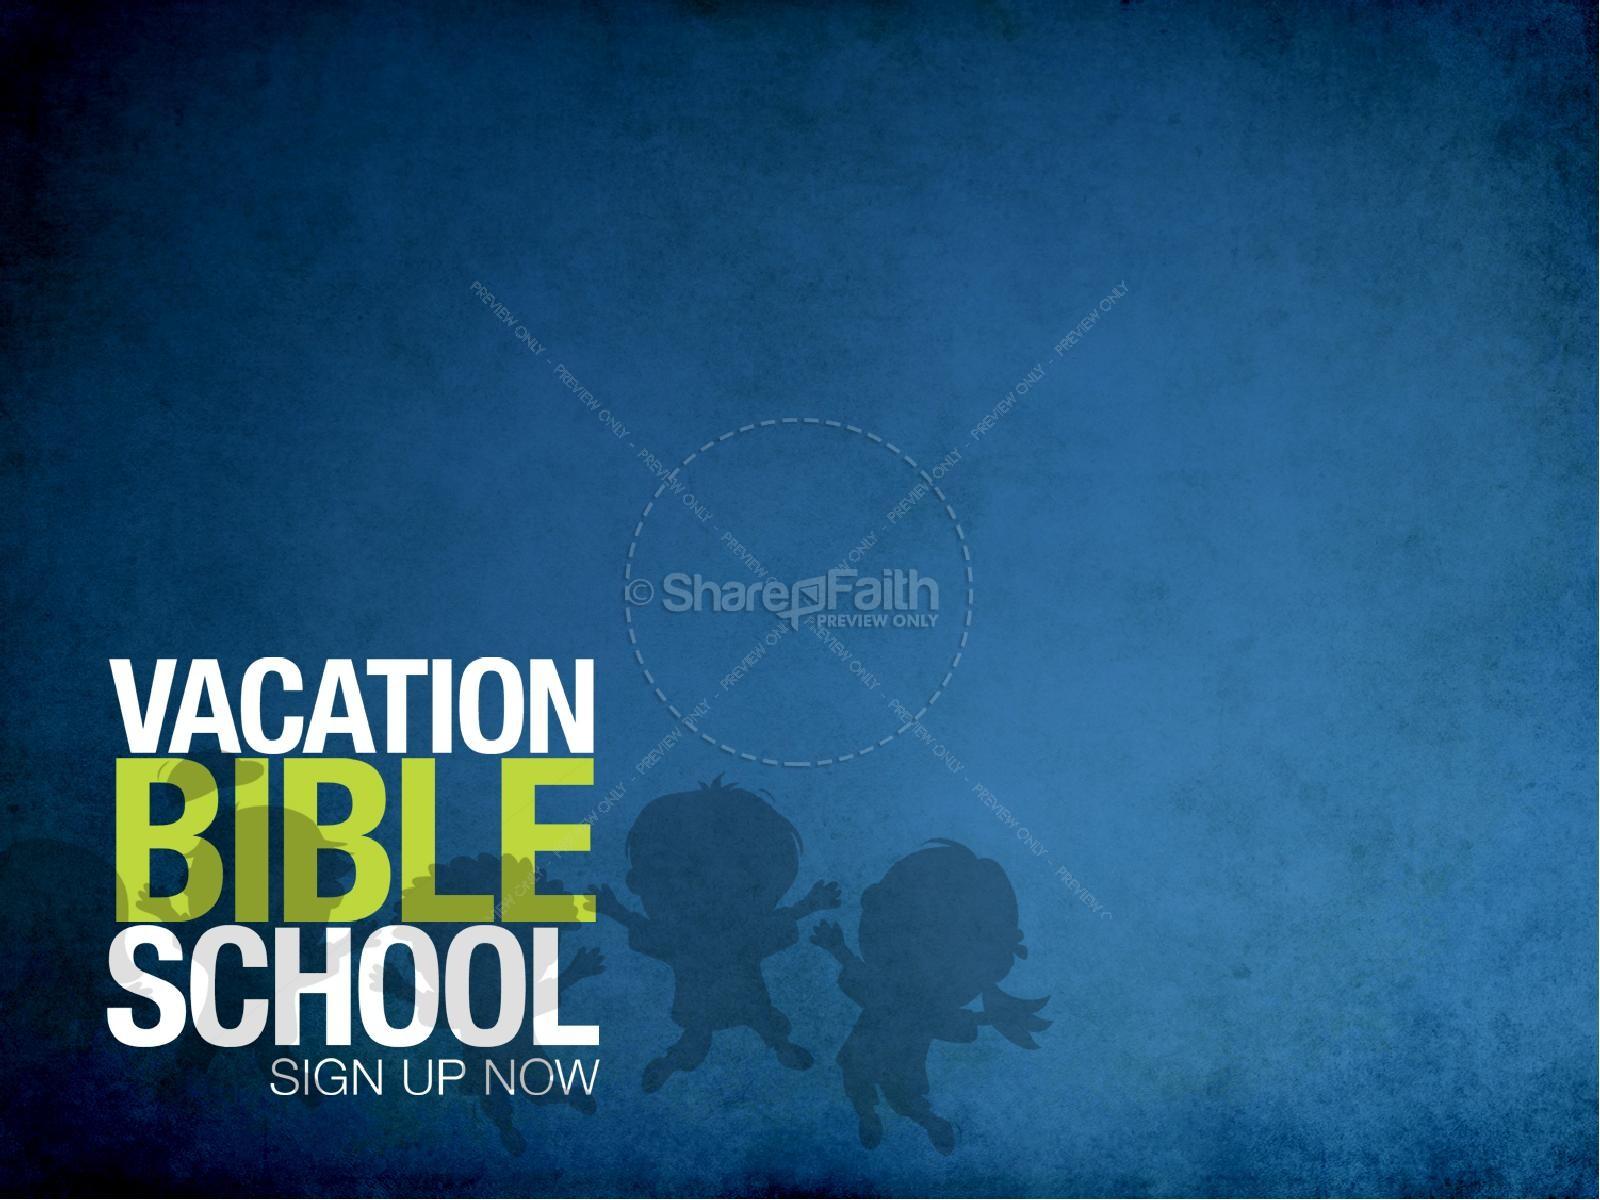 Vacation bible school powerpoint template powerpoint sermons vacation bible school powerpoint template toneelgroepblik Choice Image